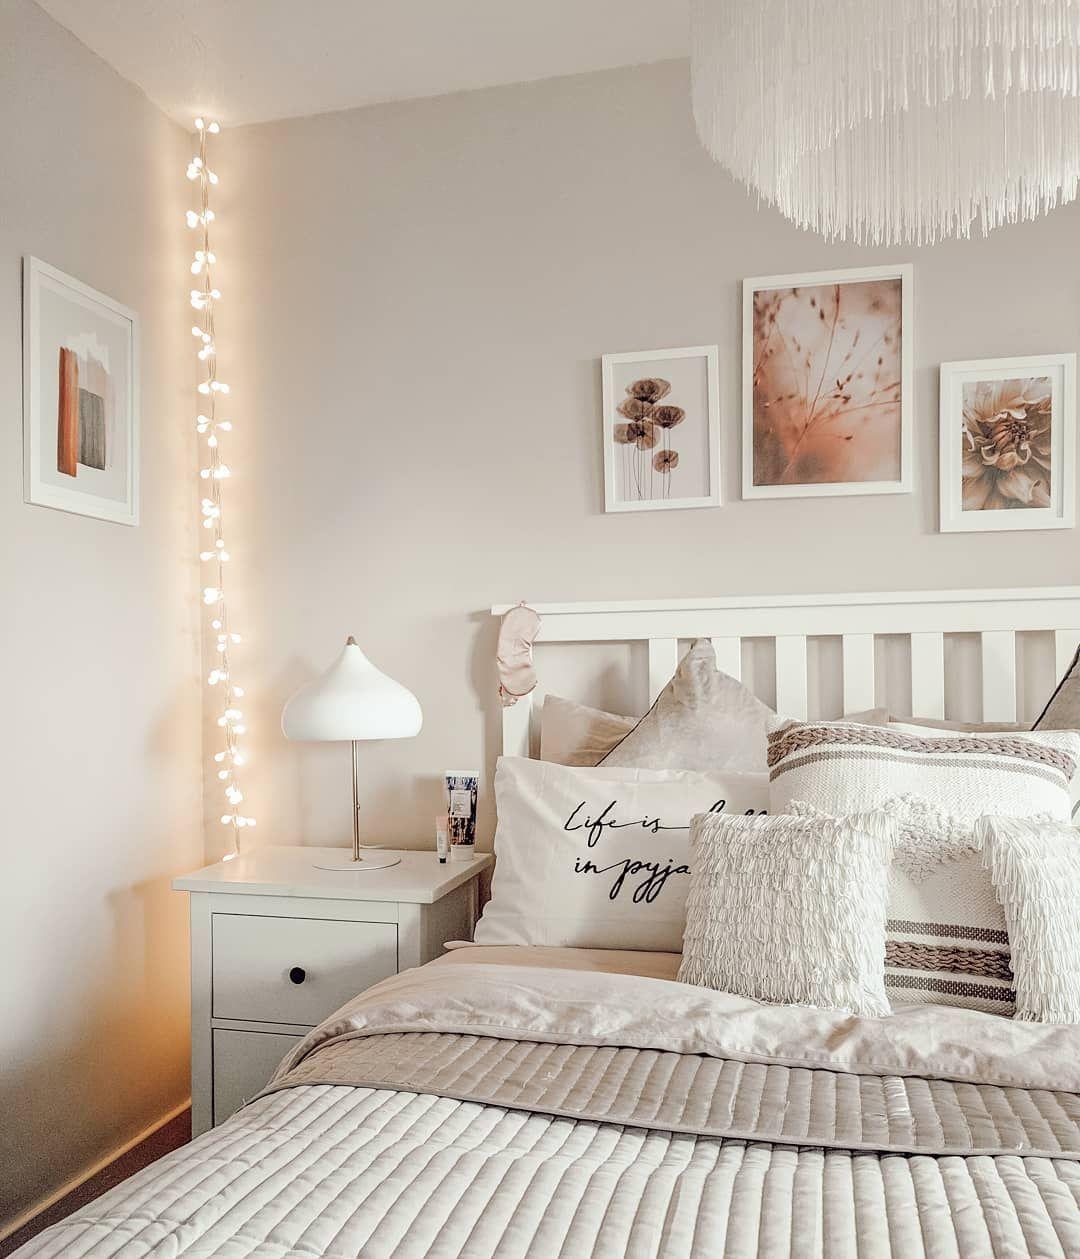 Scandi Boho Bedroom With White Ikea Hemnes Furniture And Fairy Lights Tassled Cushions Hygge Decor Pink Be Hygge Living Room Hygge Decor Hemnes Ikea Bedroom